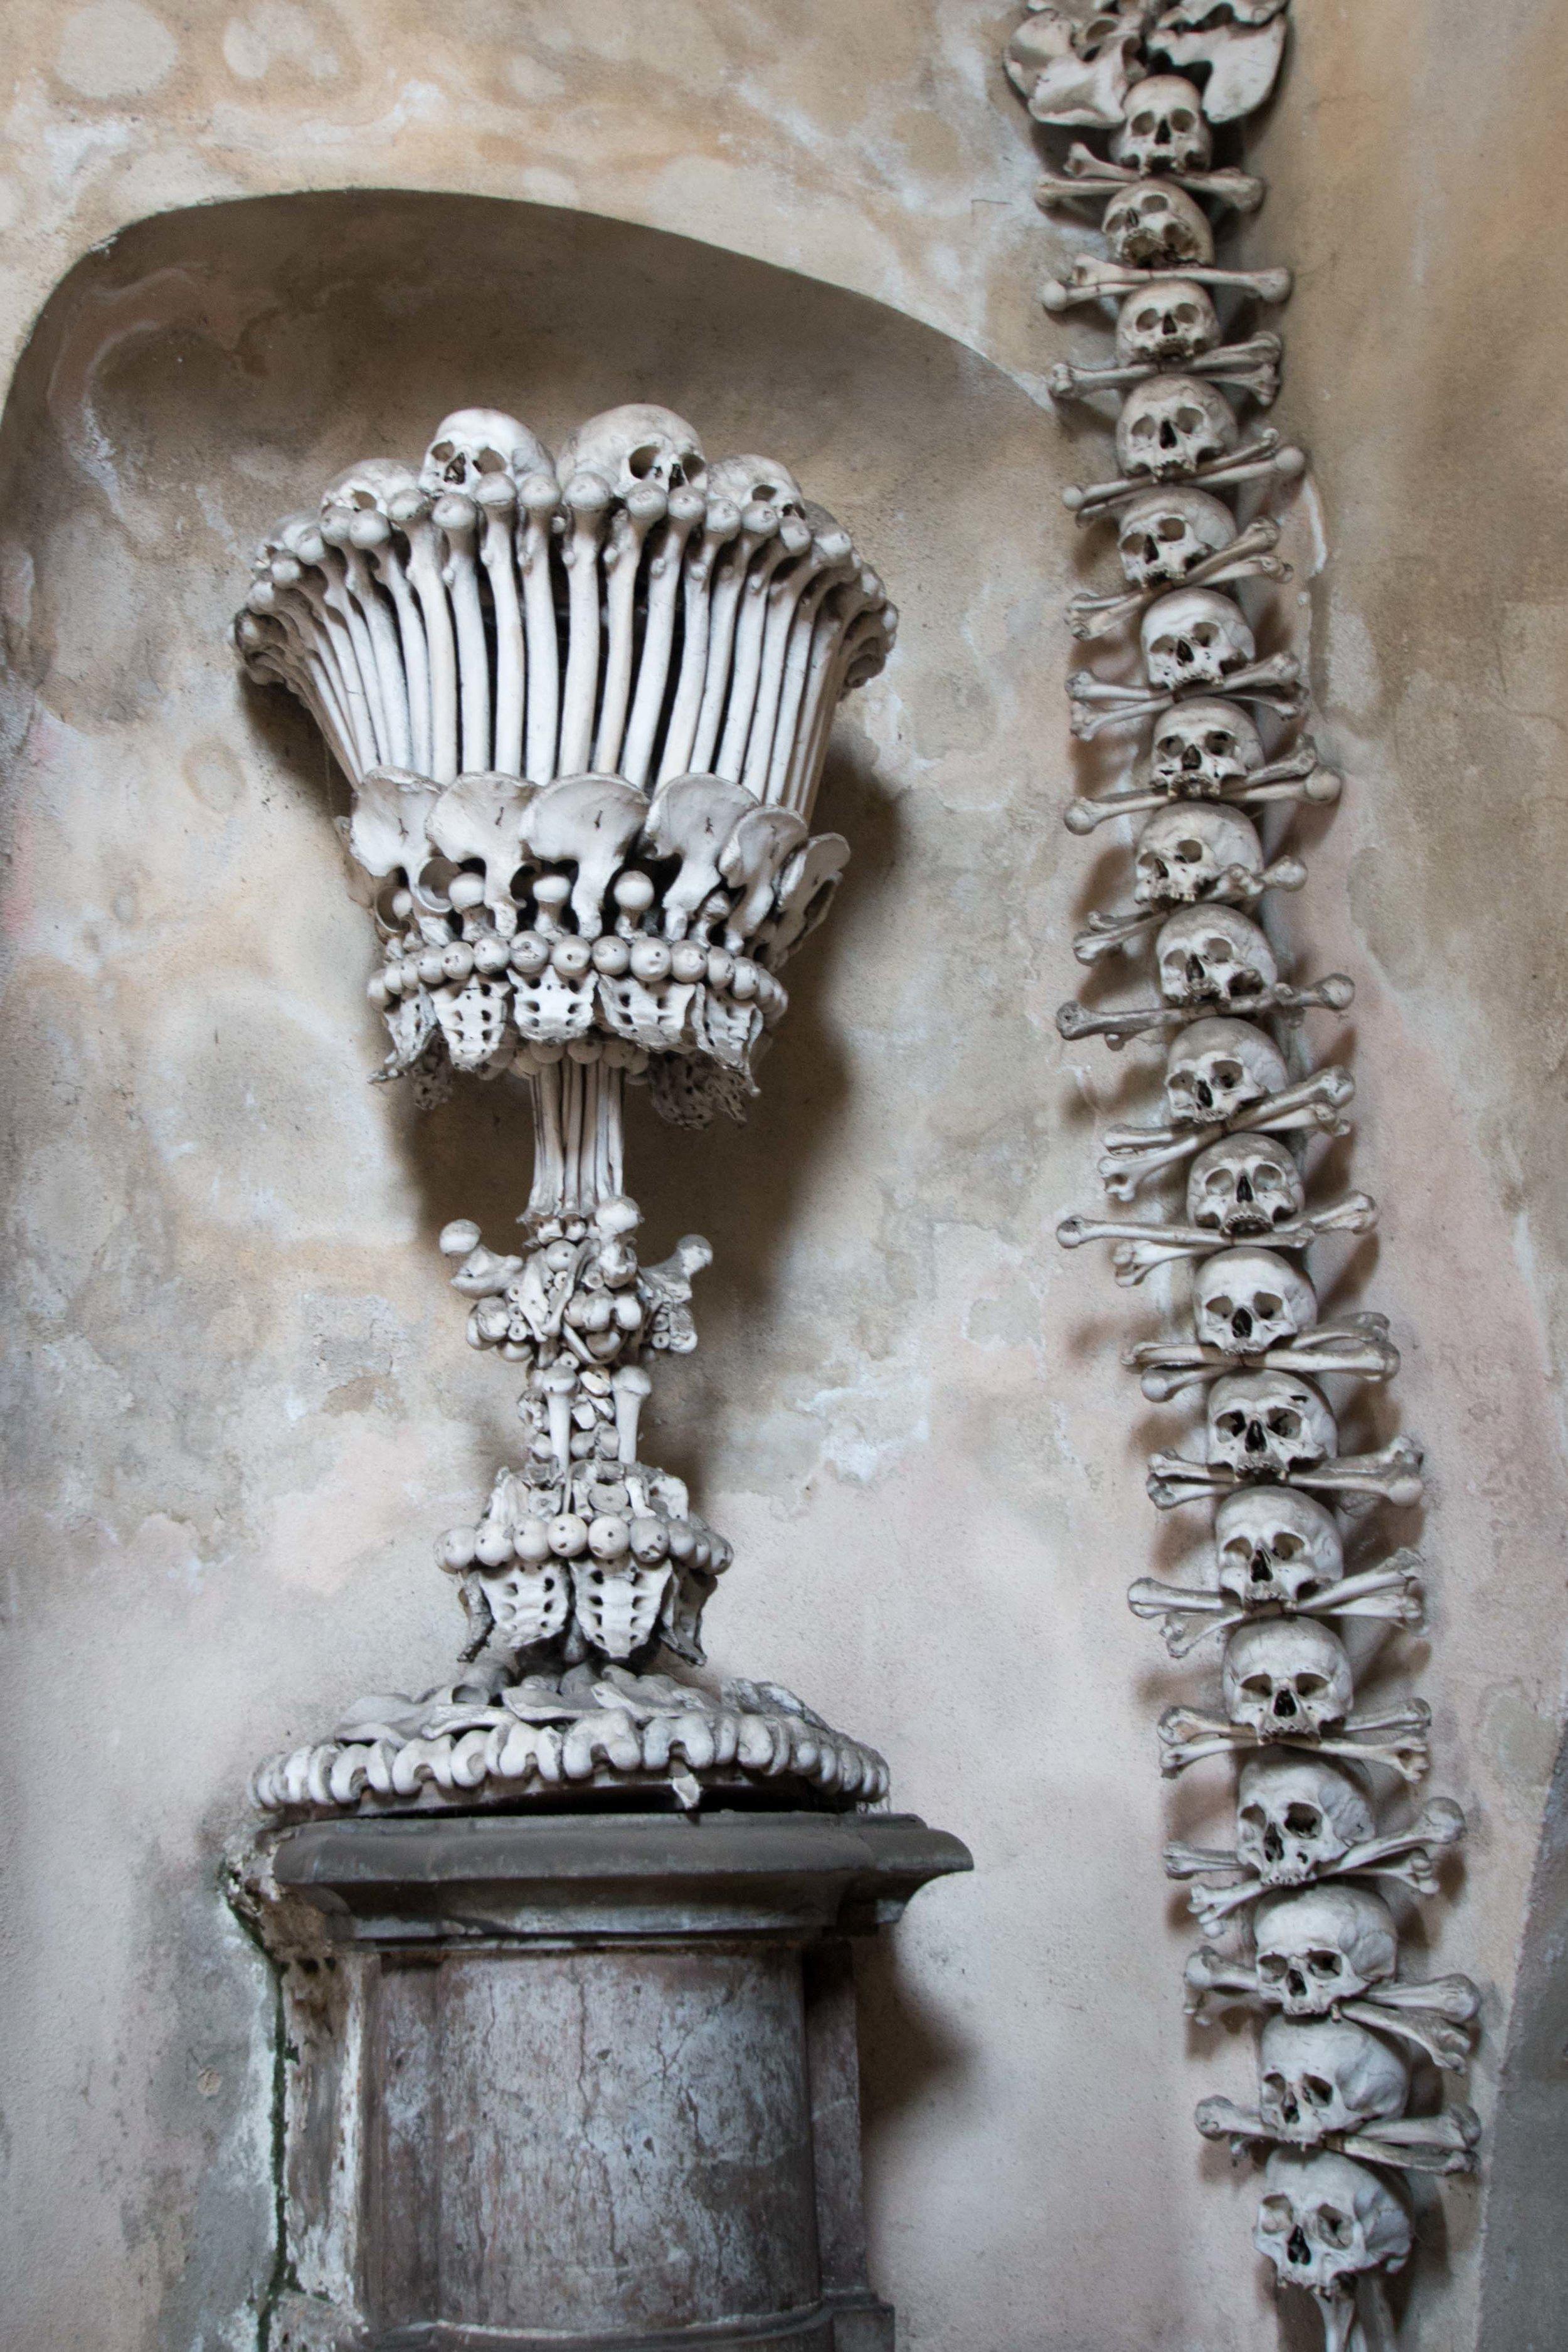 Chalice of human bones